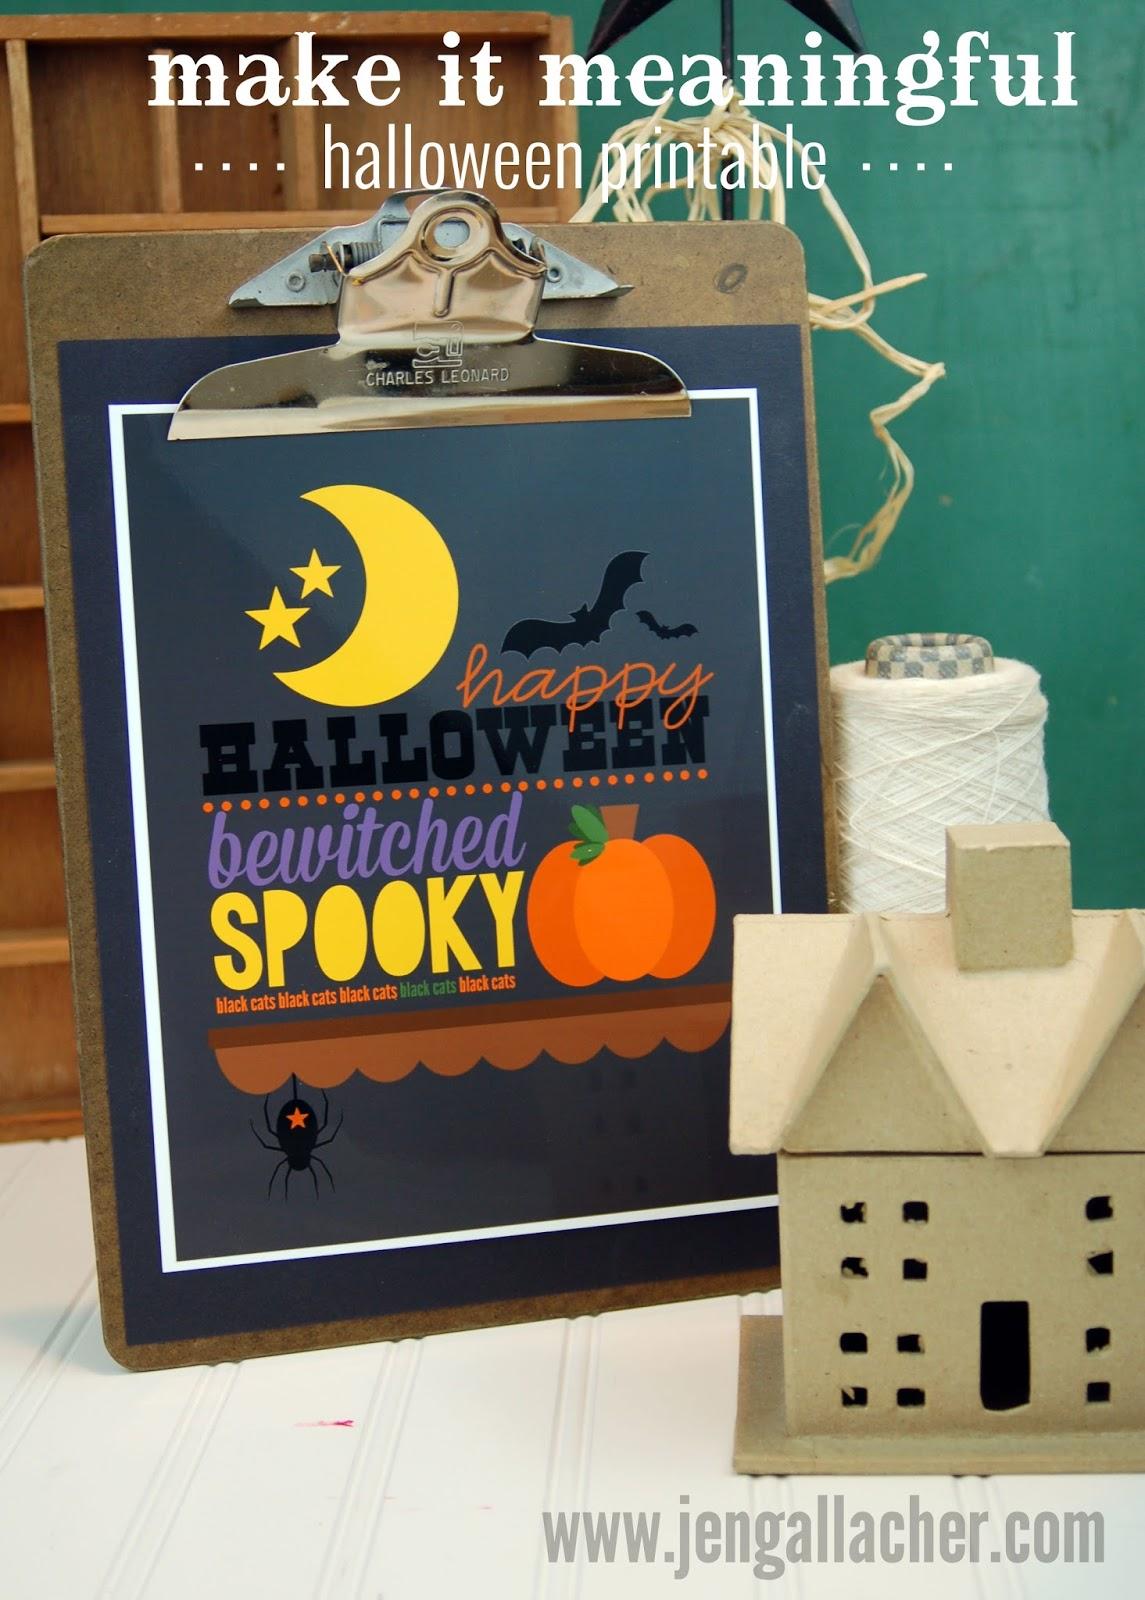 http://1.bp.blogspot.com/-6auQCdOXeUc/VDQ9jlH_SZI/AAAAAAAATO8/FFsmAcqF2s0/s1600/Halloween-Printable.jpg